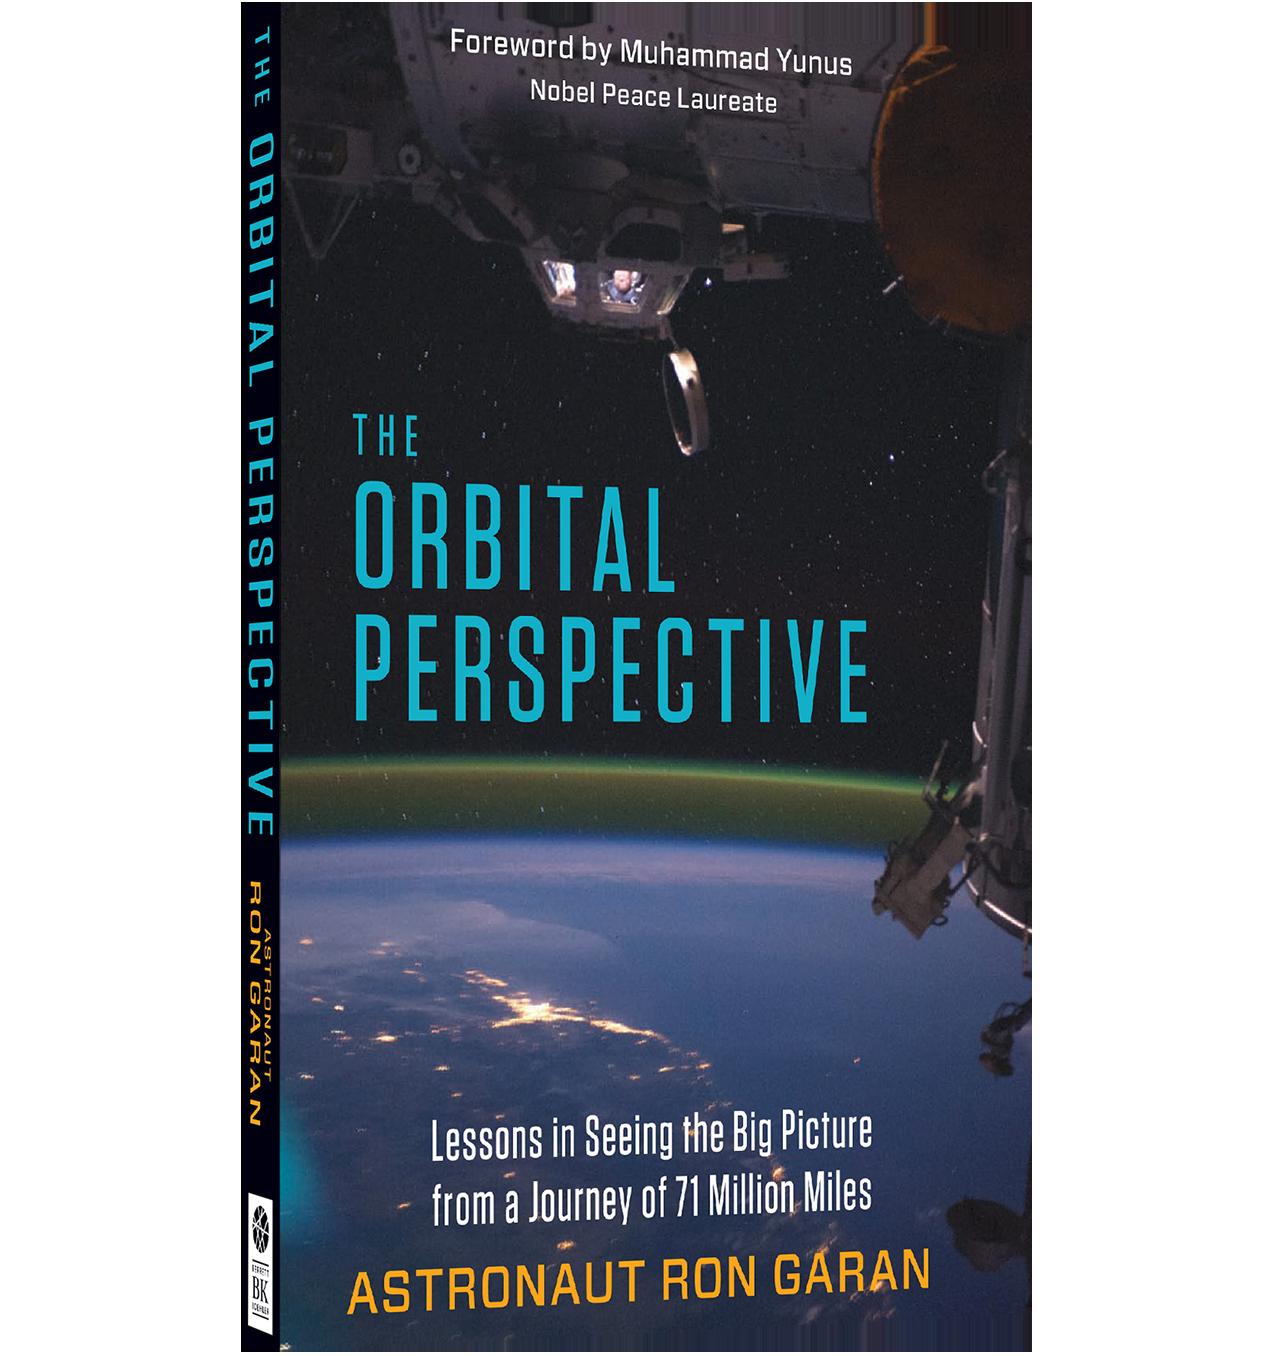 The Orbital Perspective | Astronaut Ron Garan